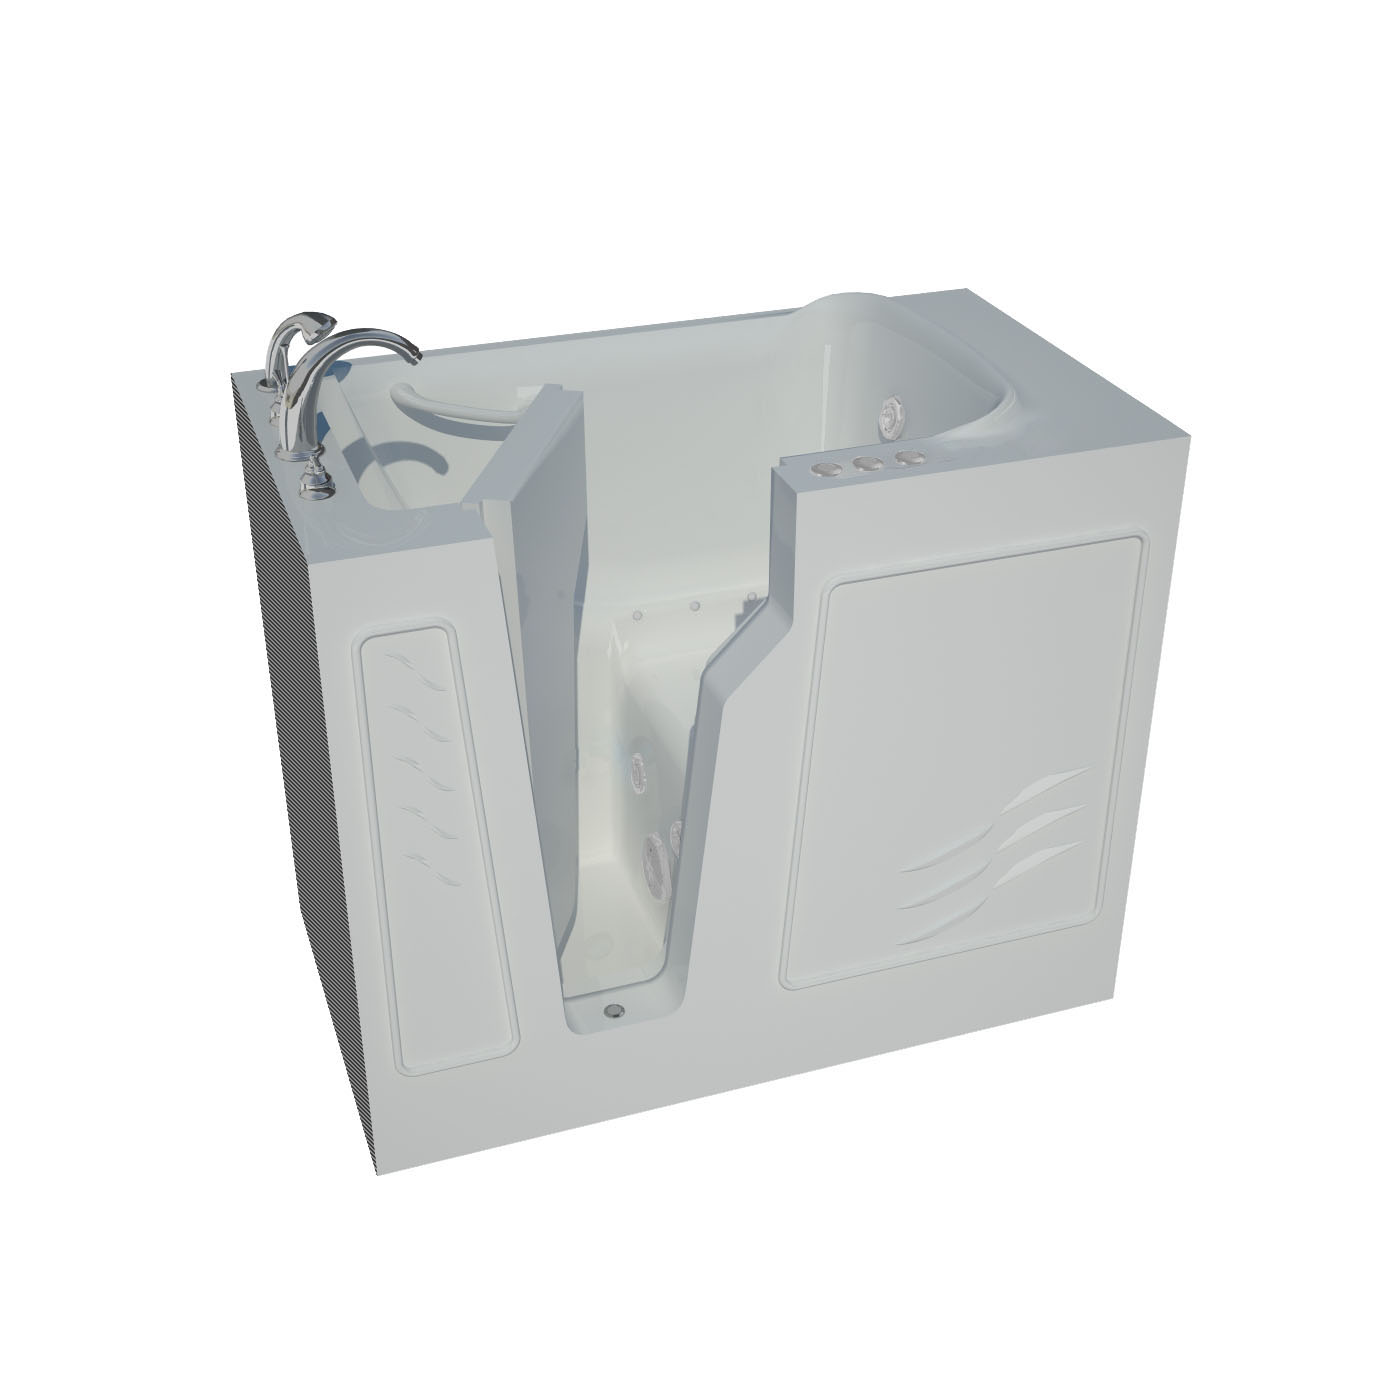 26 x 46 Left Drain Whirlpool & Air Jetted Walk-In Bathtub in White